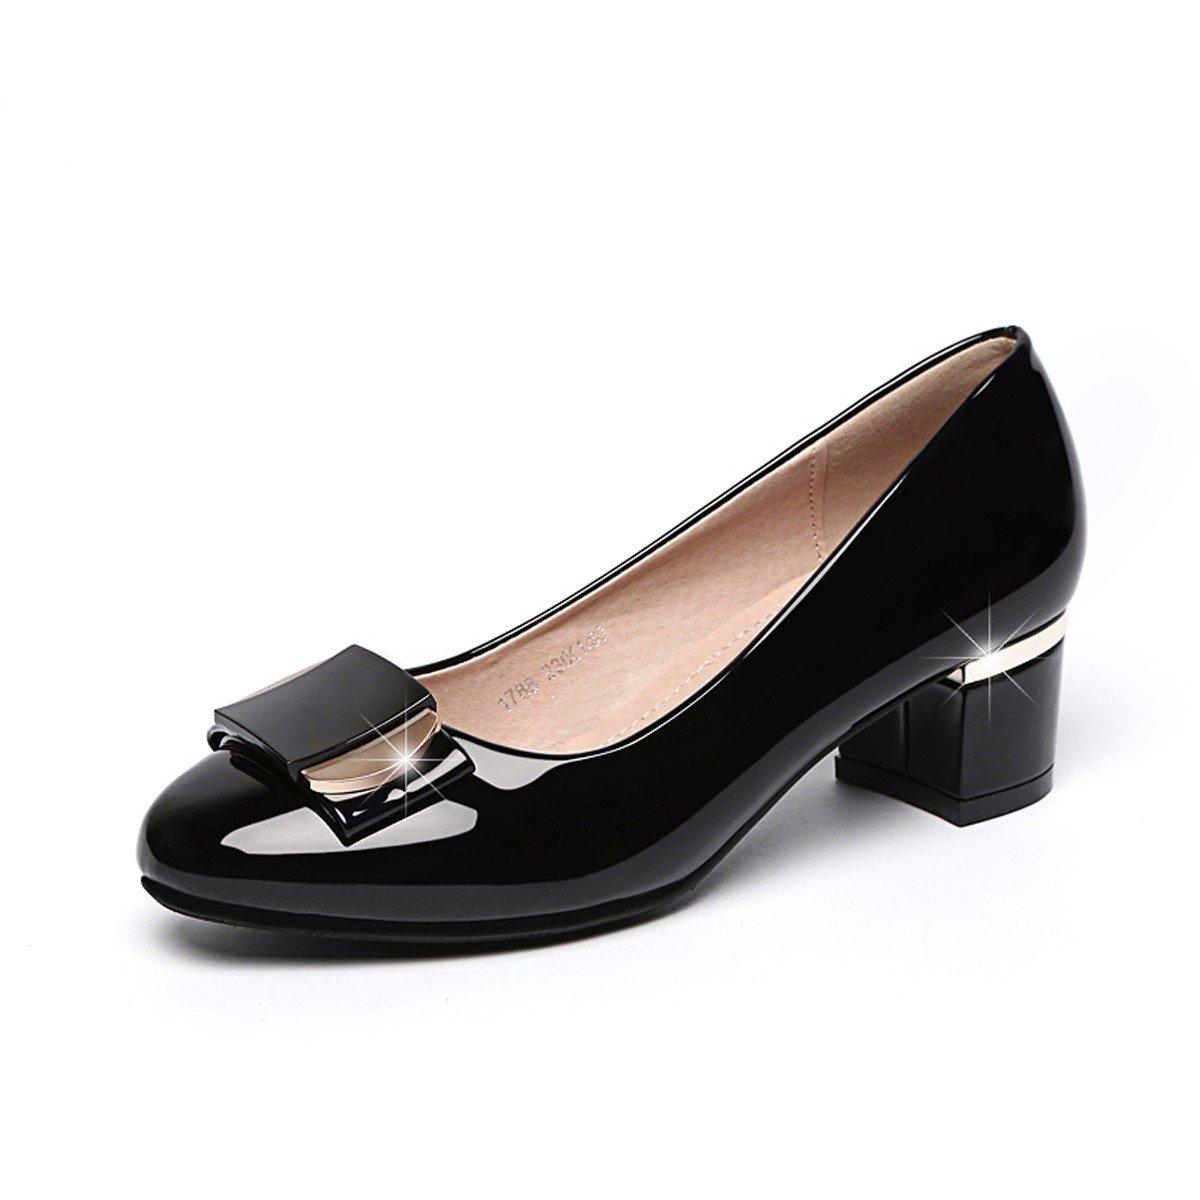 HBDLH-Damenschuhe/Sommer-Leder Single Mittlere Betuchte Pumps High Heels Runde Flache Schuhe.